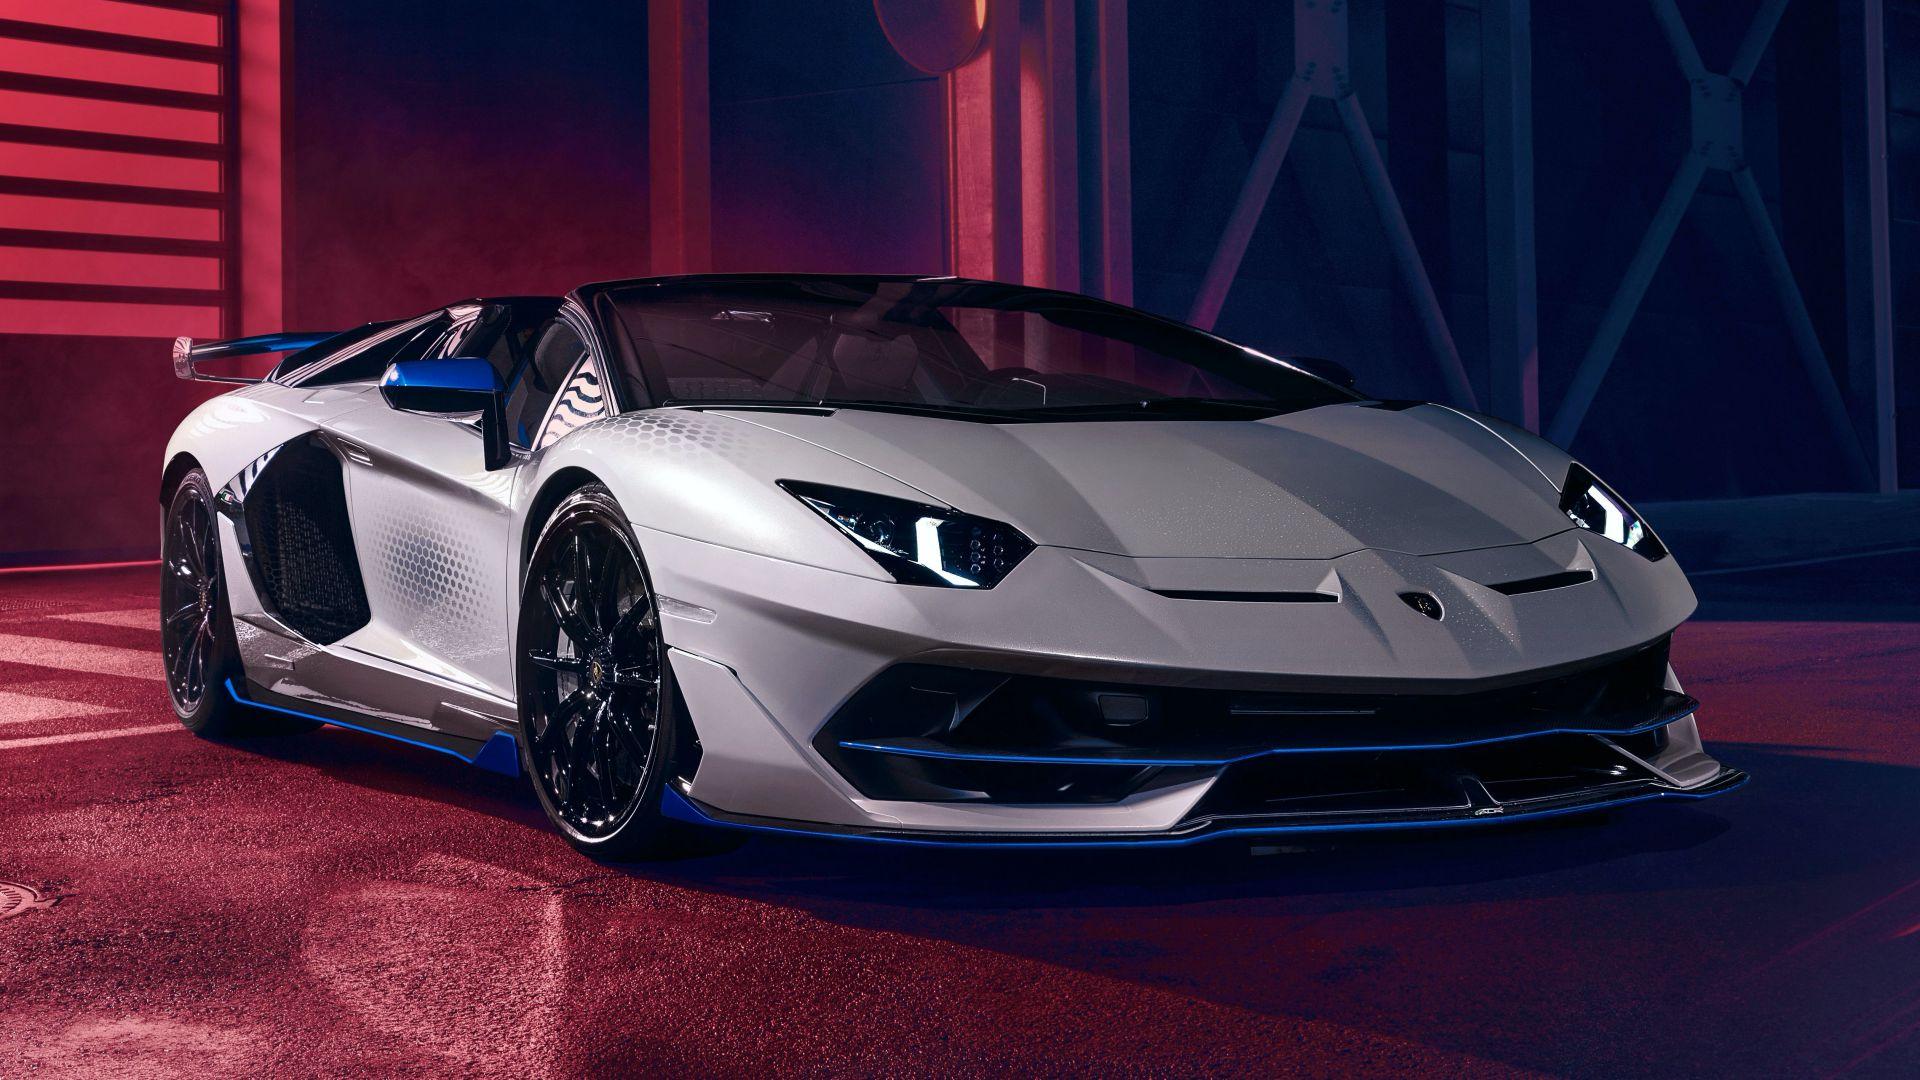 Lamborghini Aventador price in Pakistan